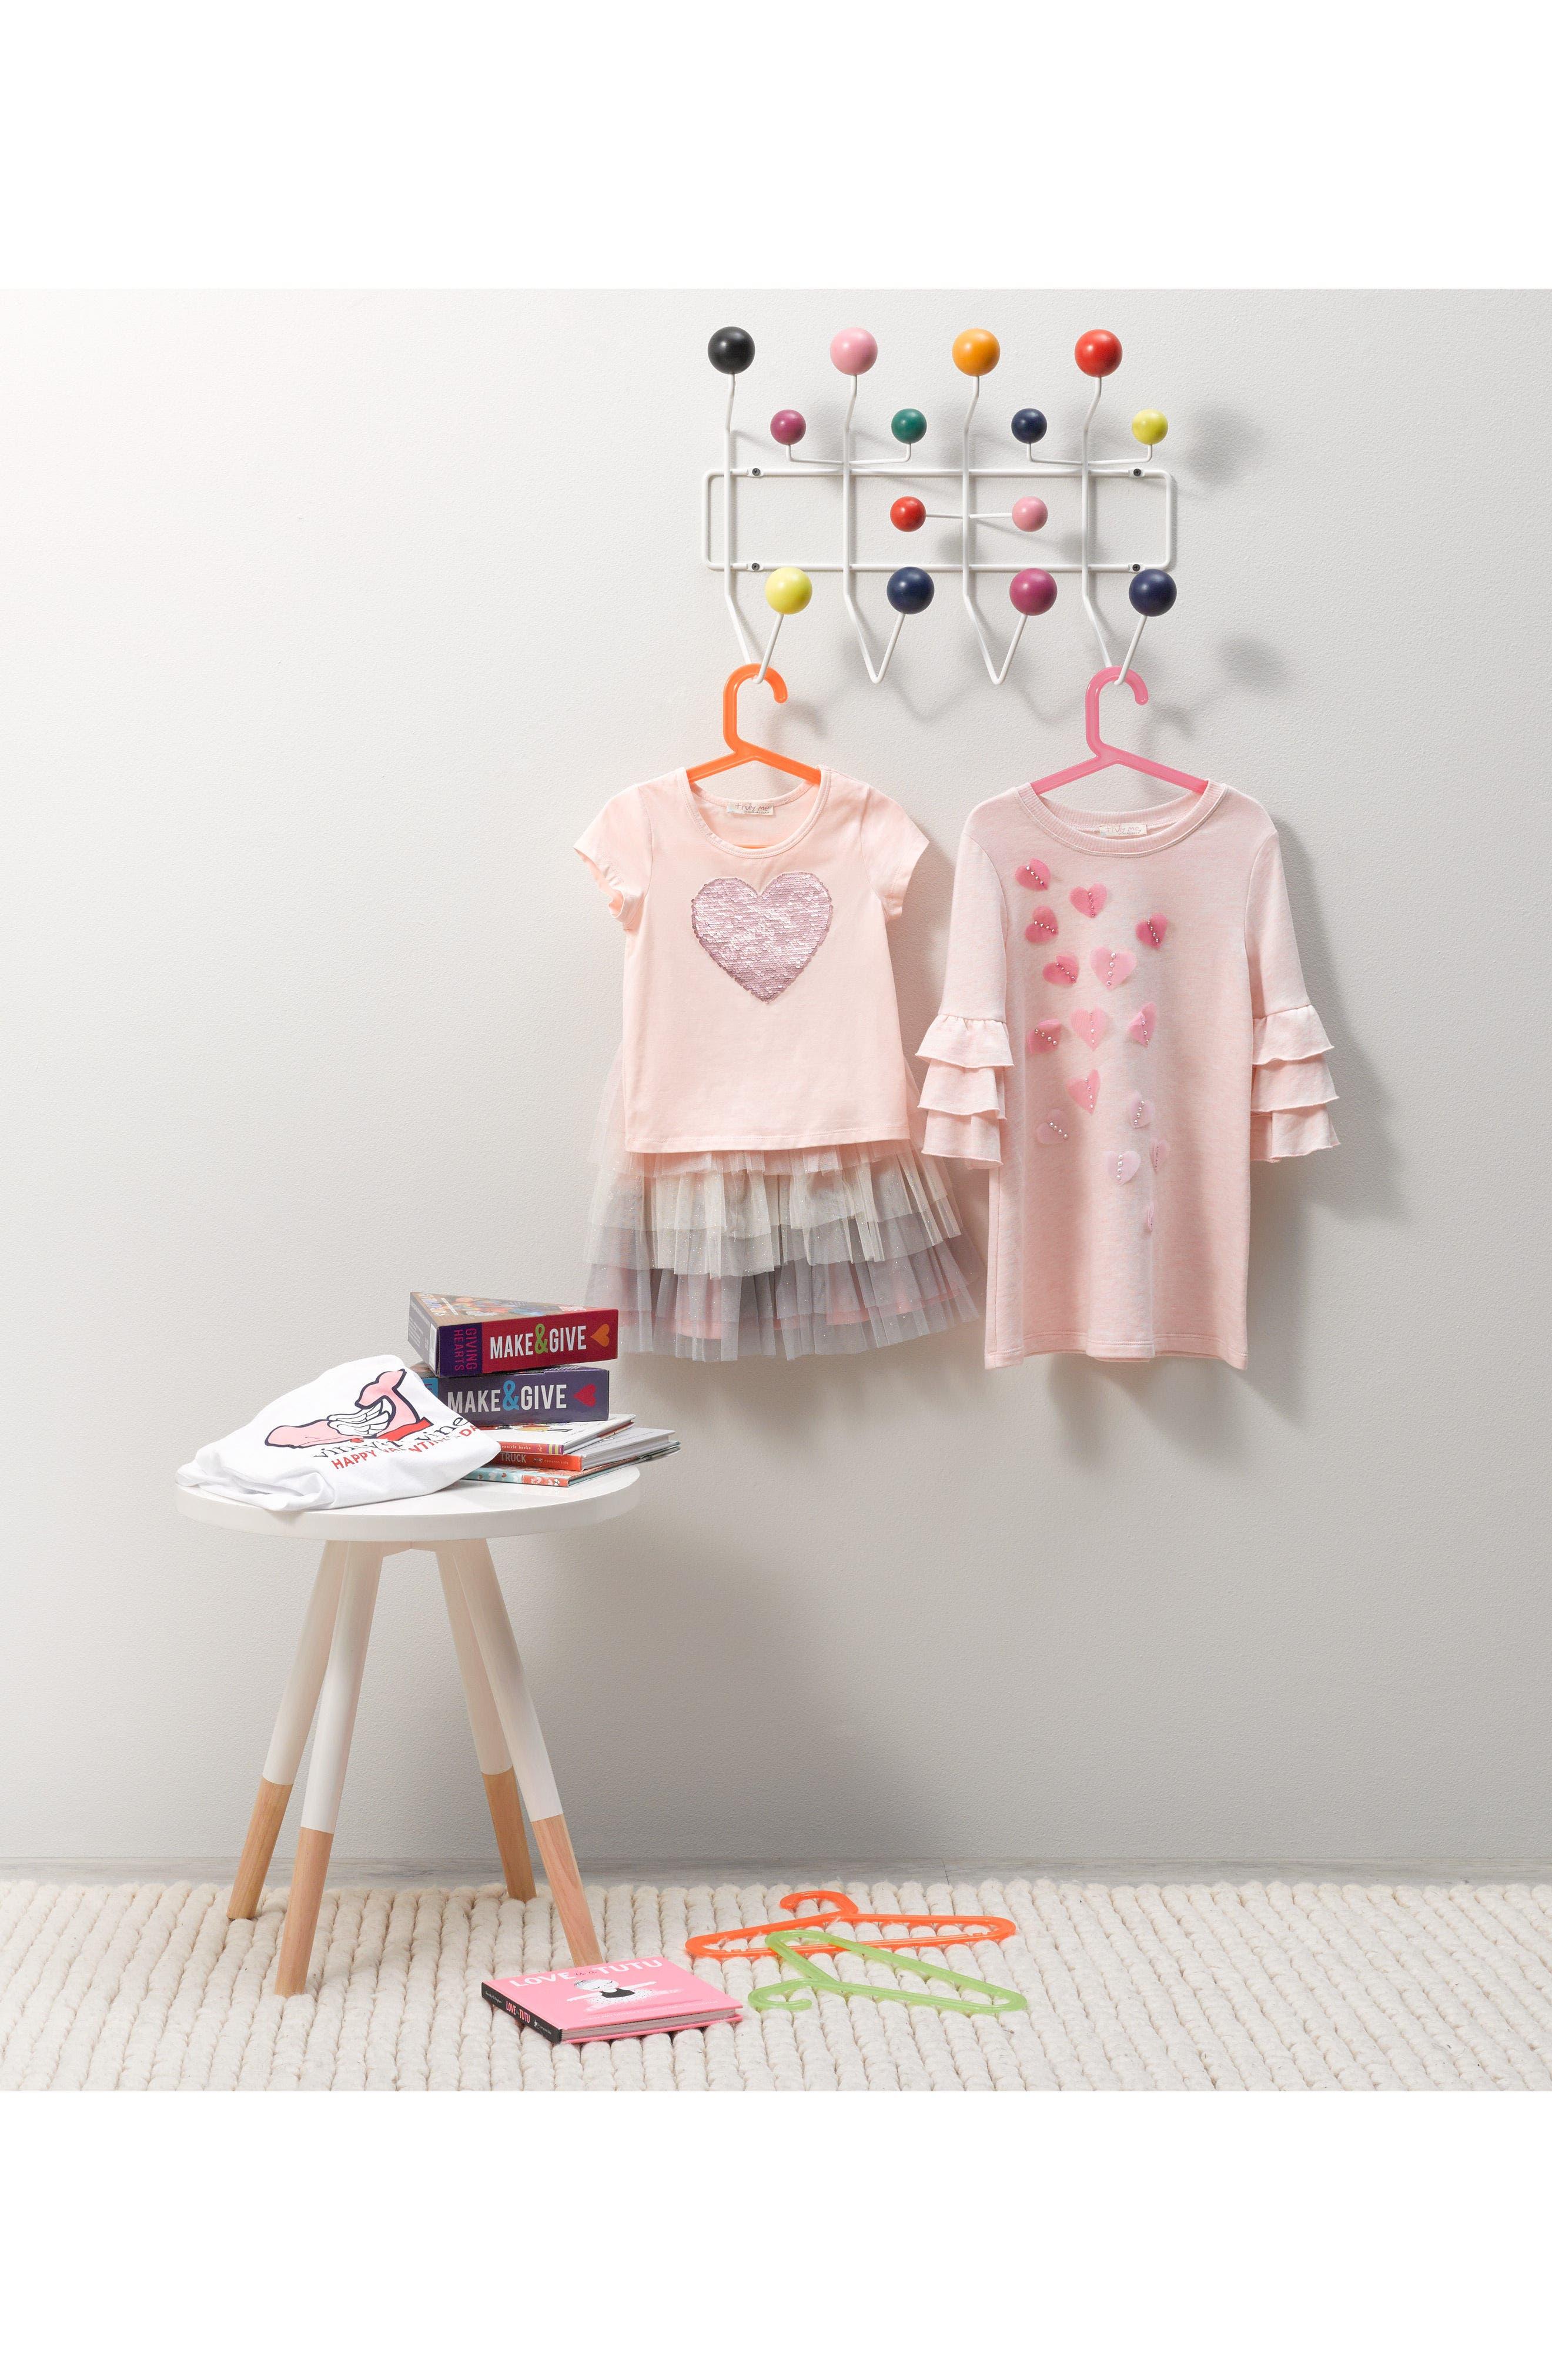 Make & Give Giving Hearts Craft Kit,                             Alternate thumbnail 4, color,